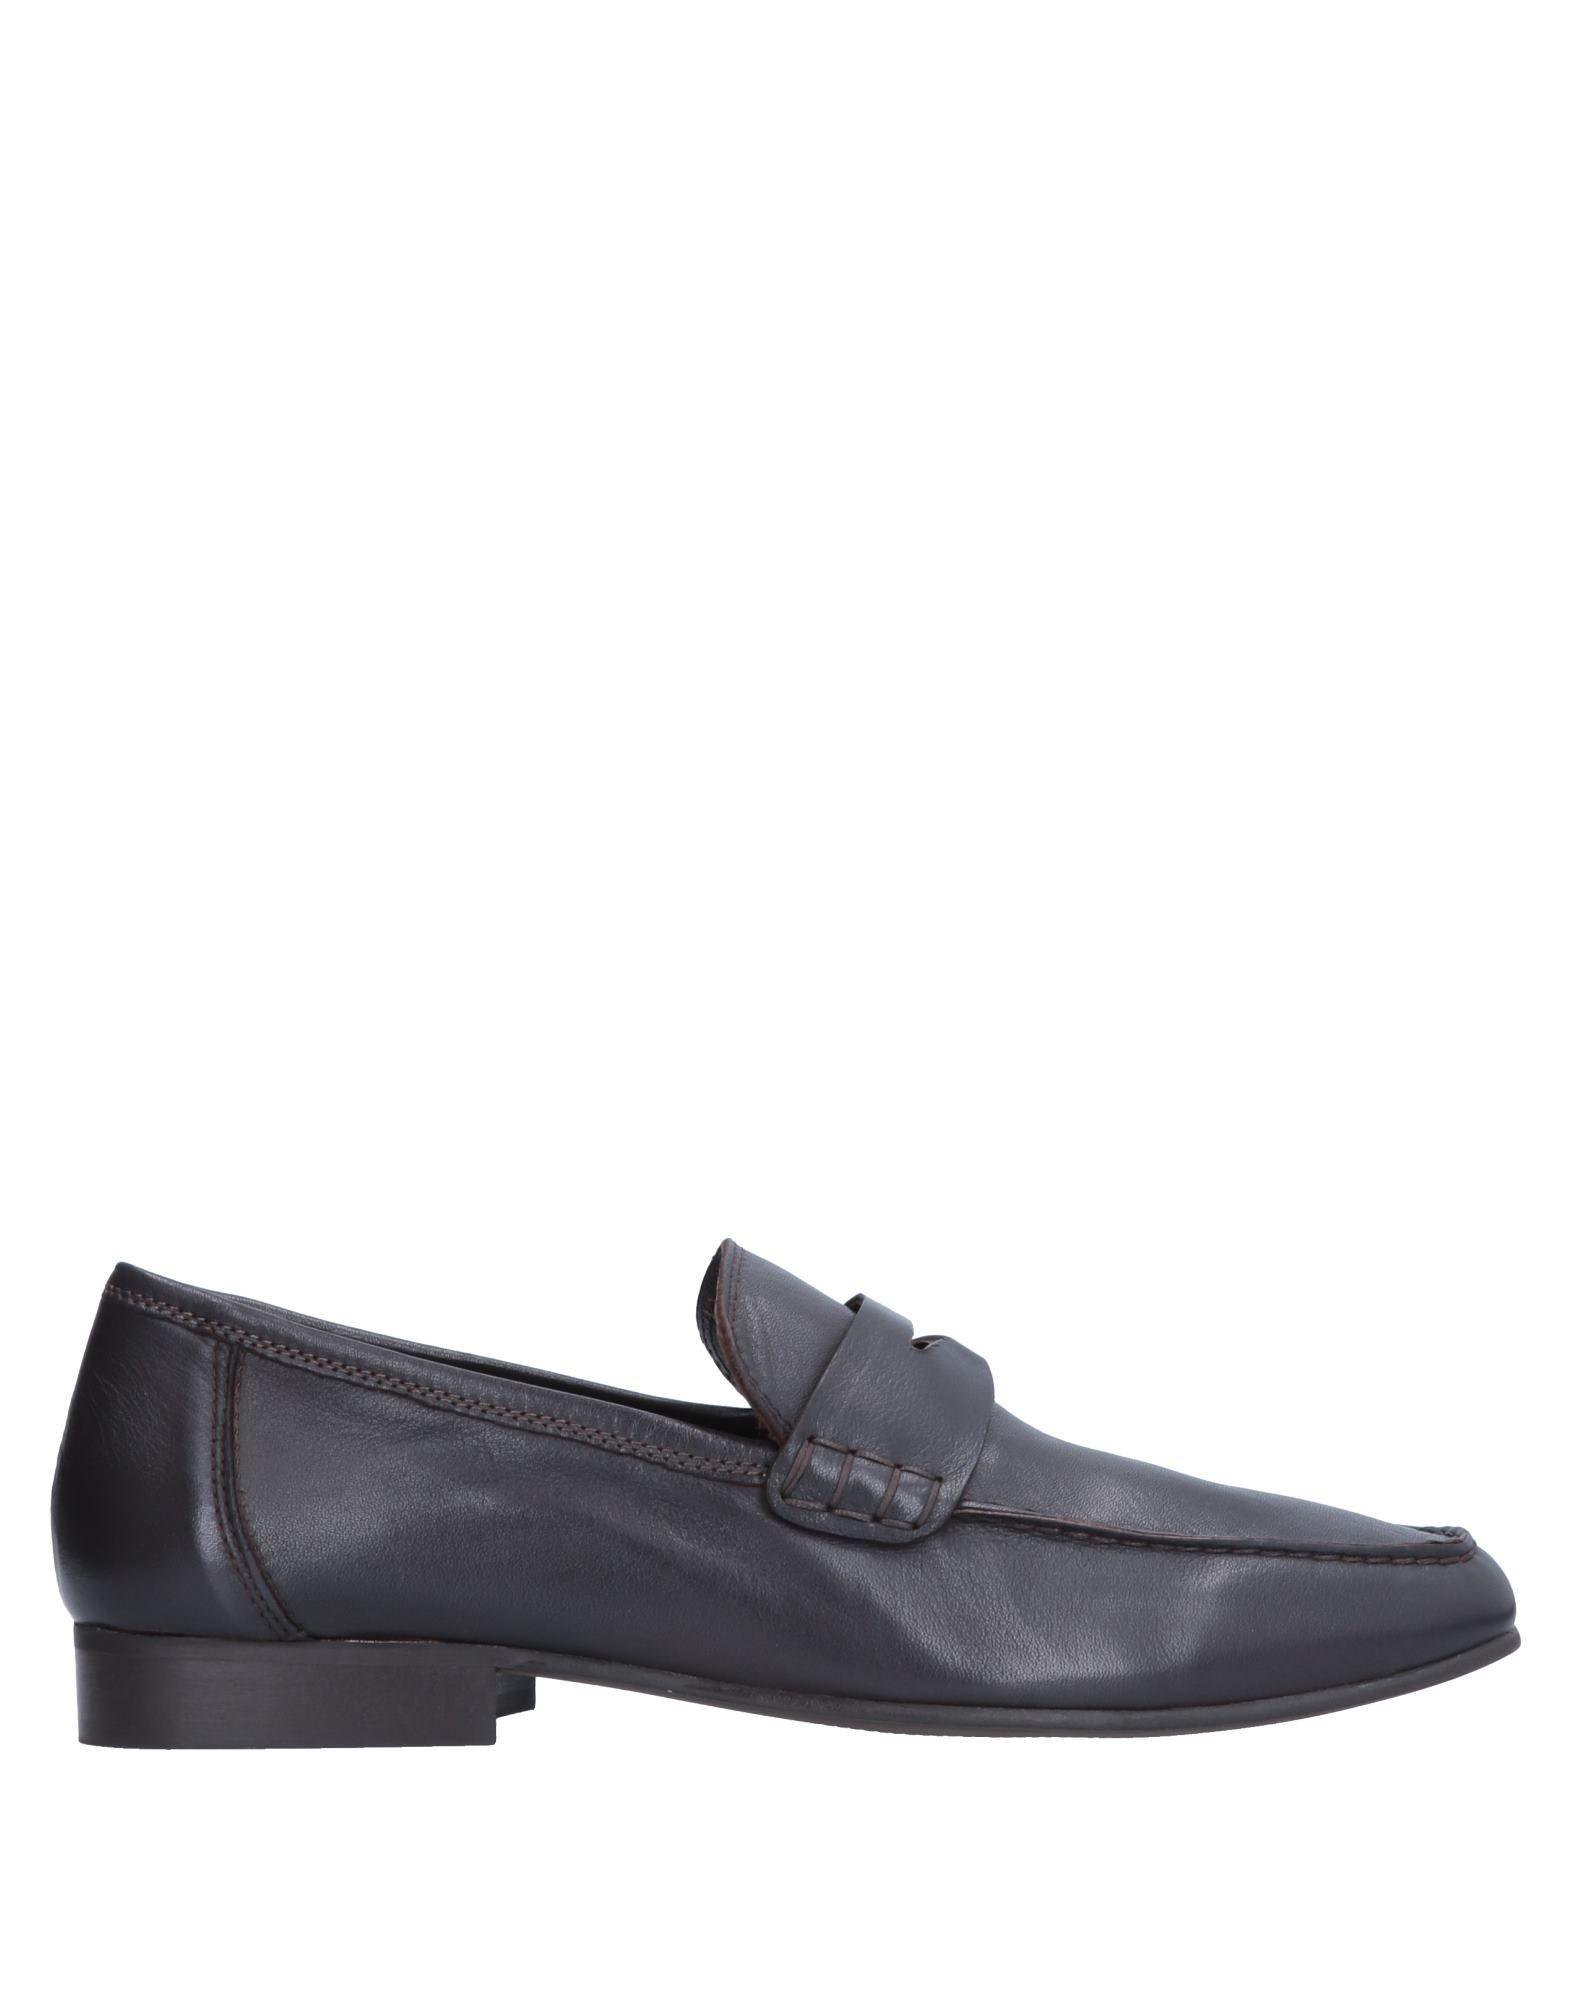 A.Testoni Mokassins Herren  11547067NJ Gute Qualität beliebte Schuhe